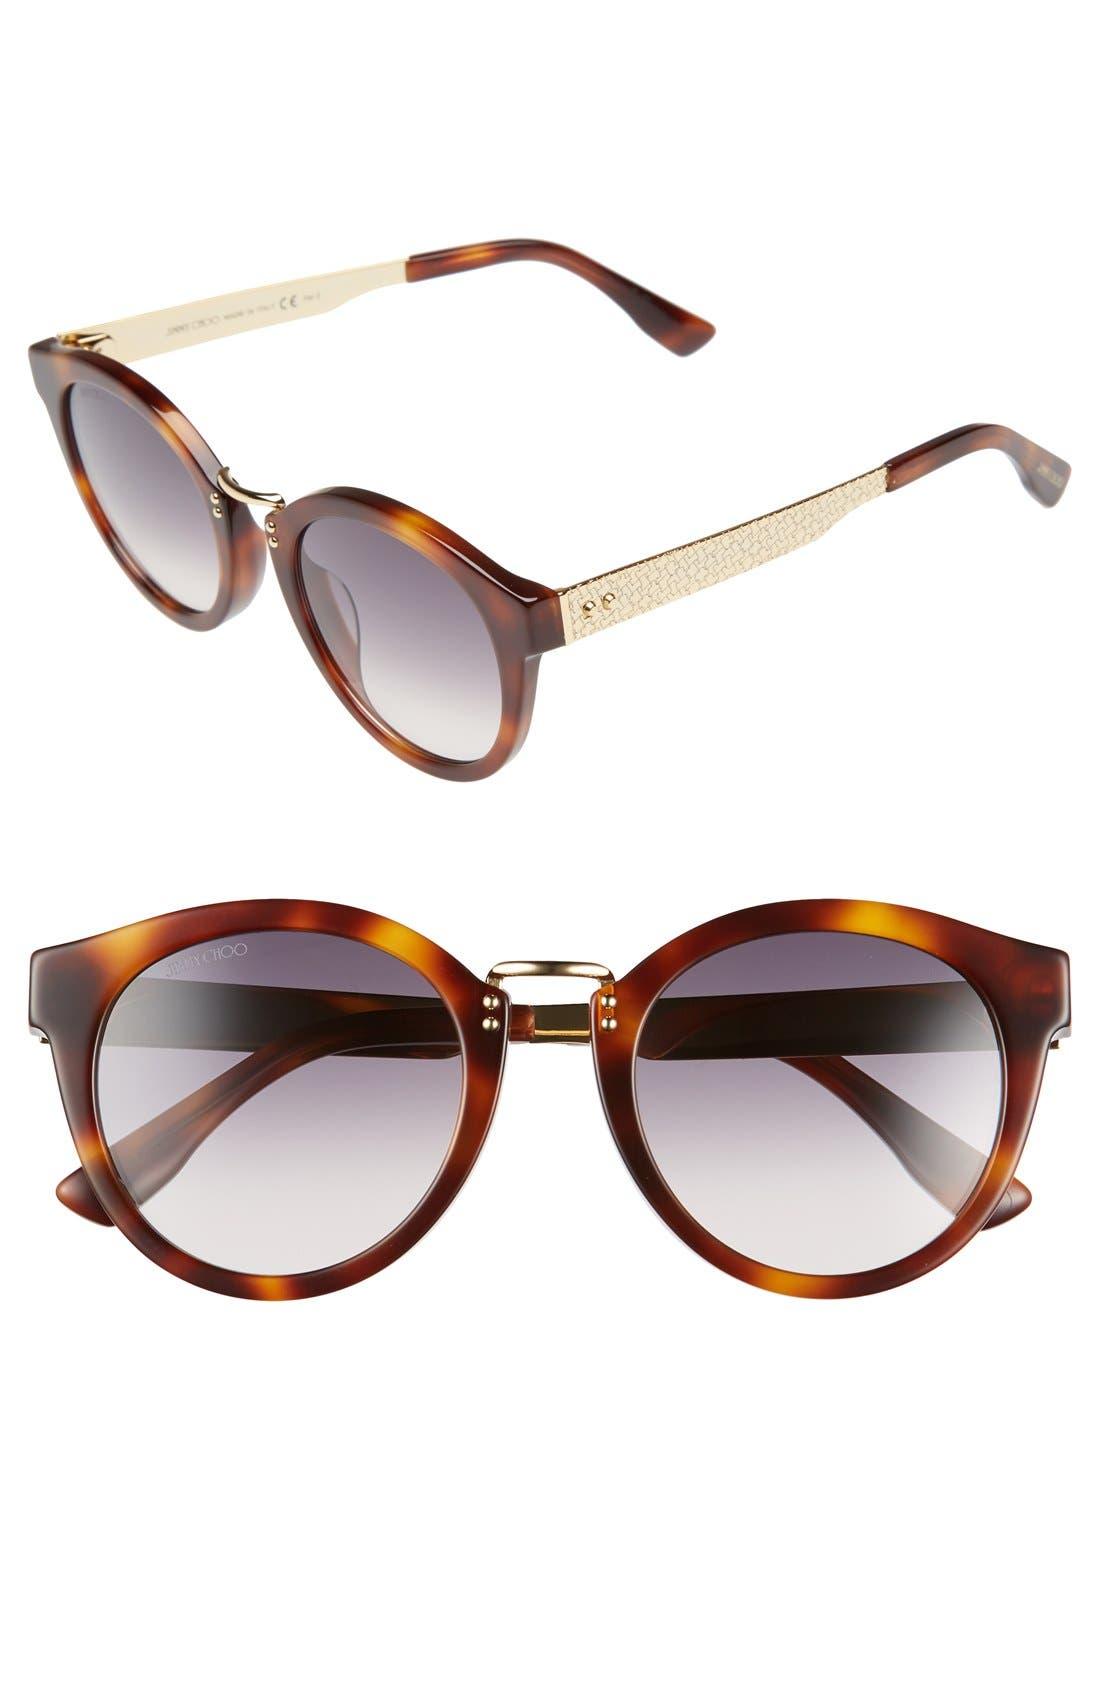 Jimmy Choo 'Pepys' 50mm Retro Sunglasses